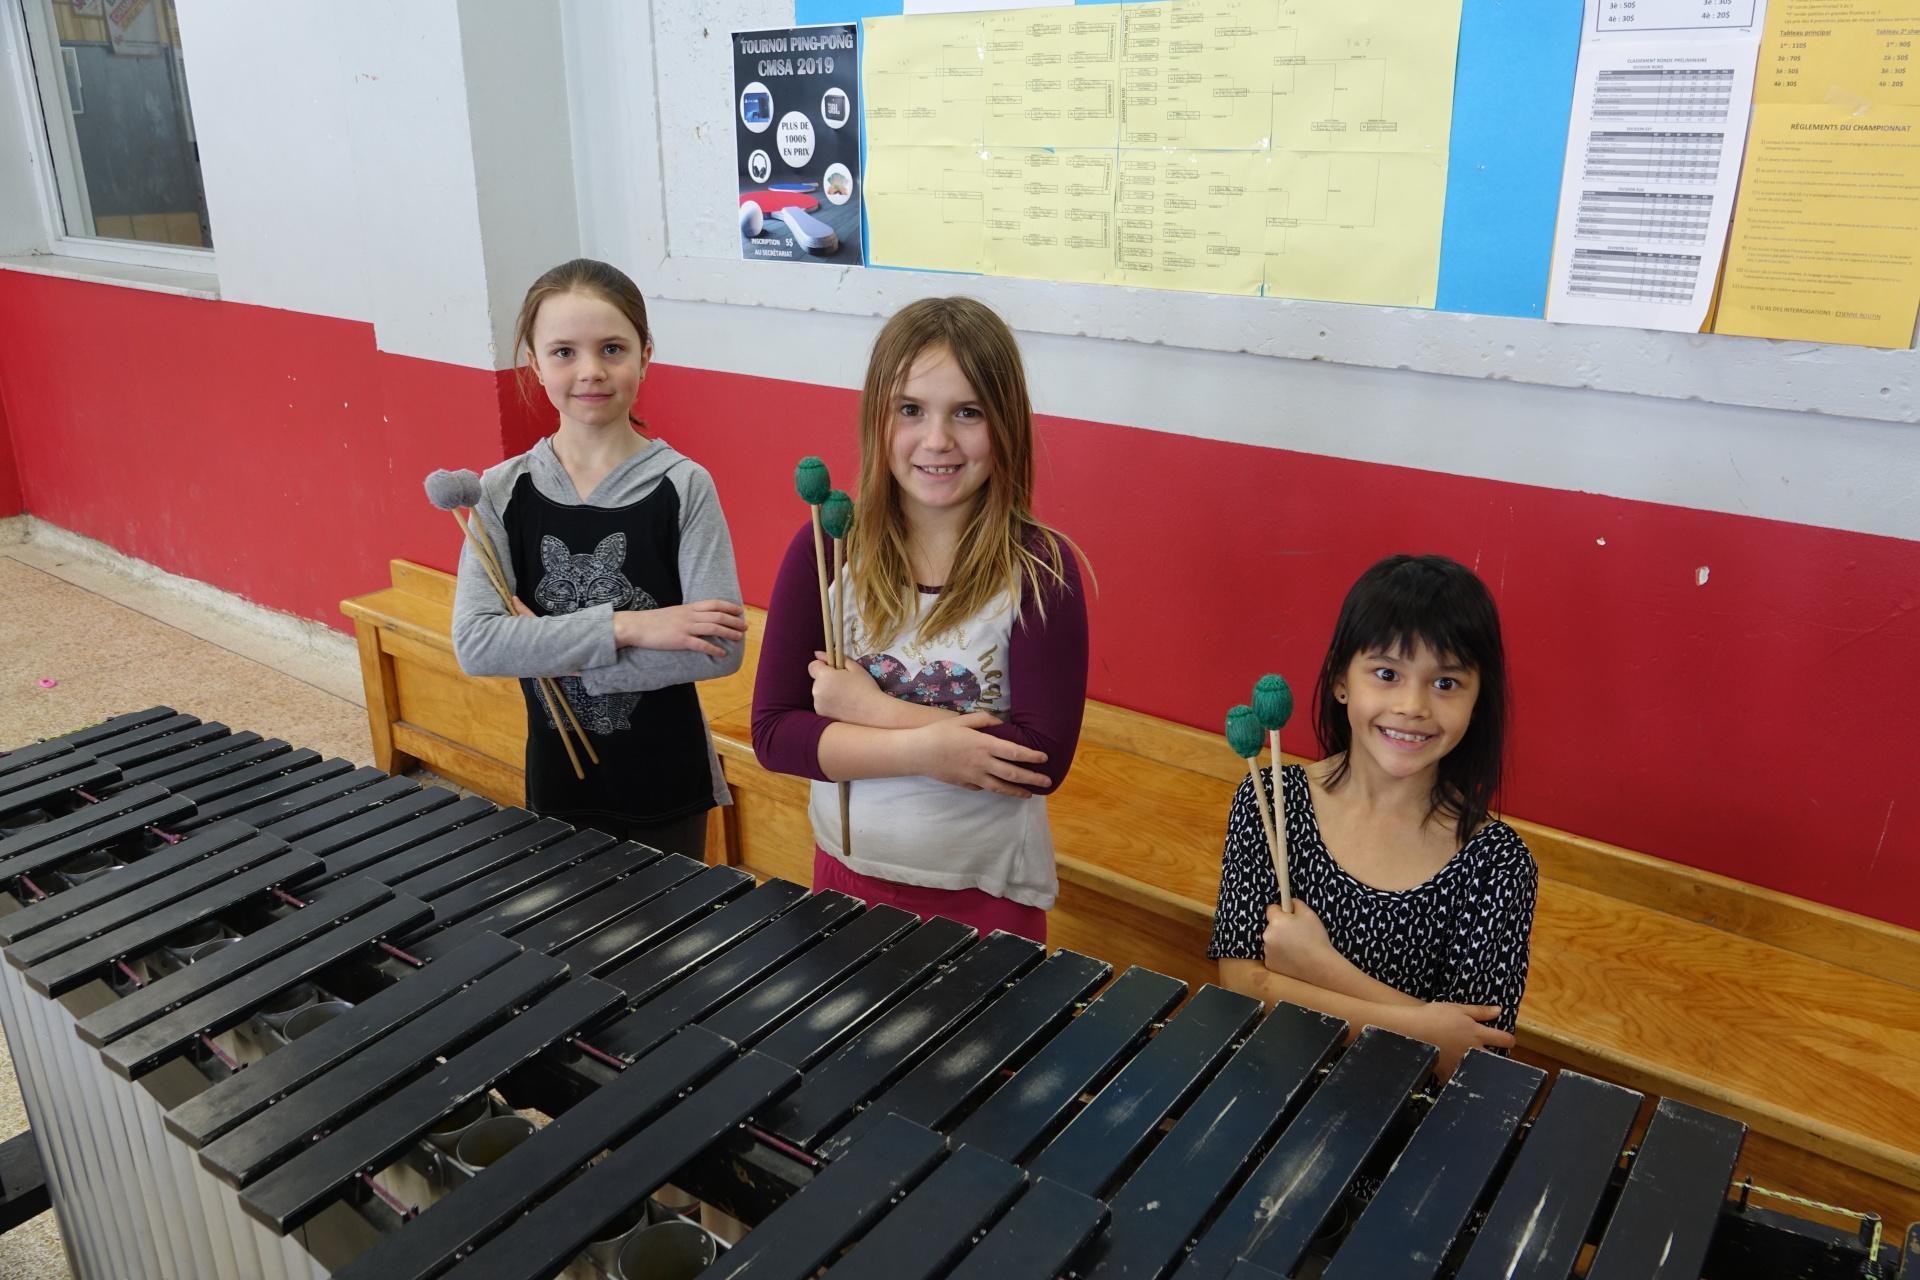 Les Xylophones